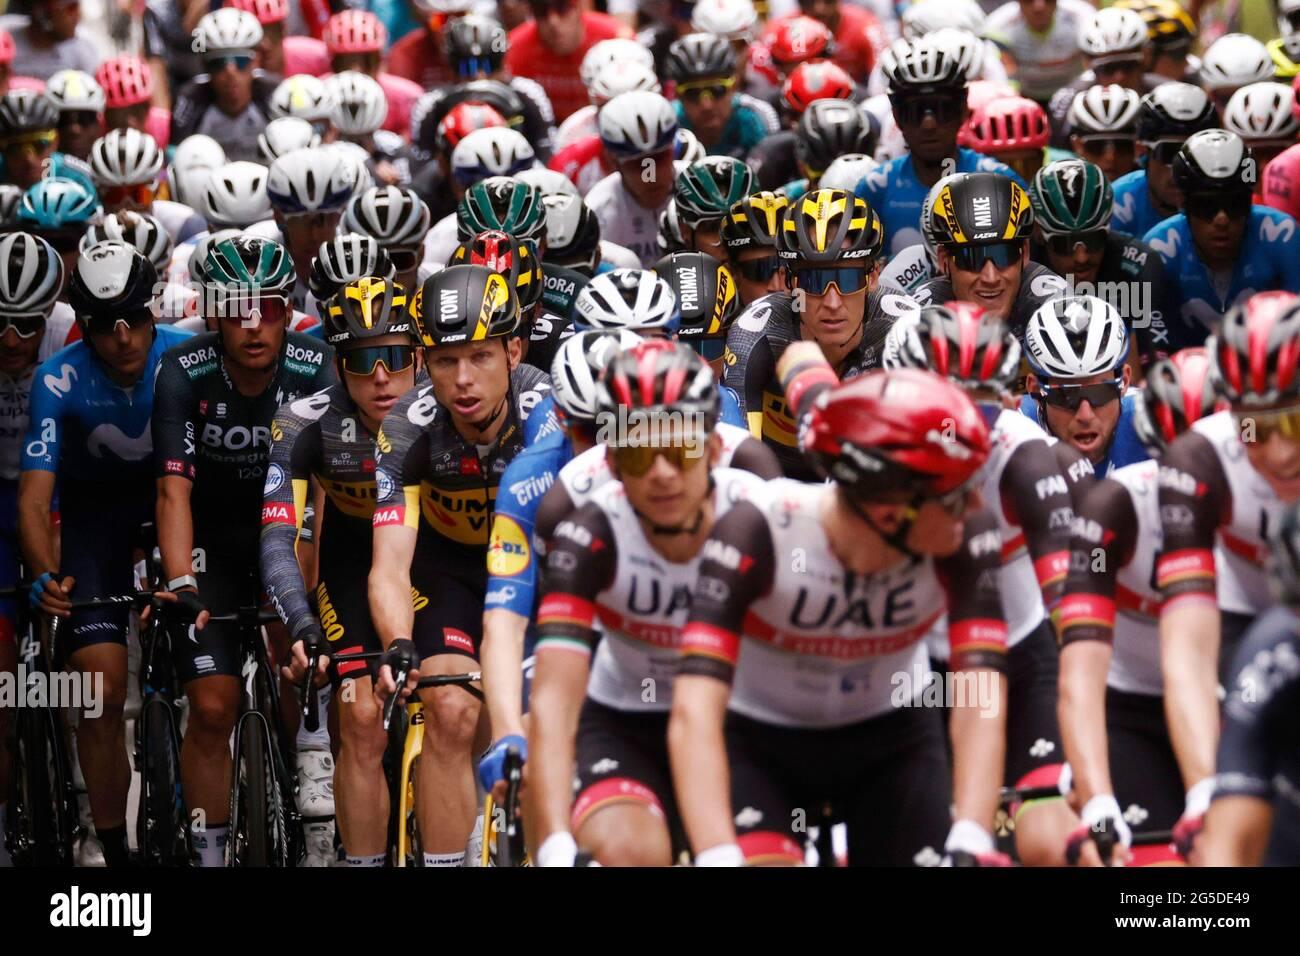 Ciclismo - Tour de France - Stage 1 - Brest to Landerneau - France - June 26, 2021 il peloton in azione REUTERS/Stephane Mahe Foto Stock